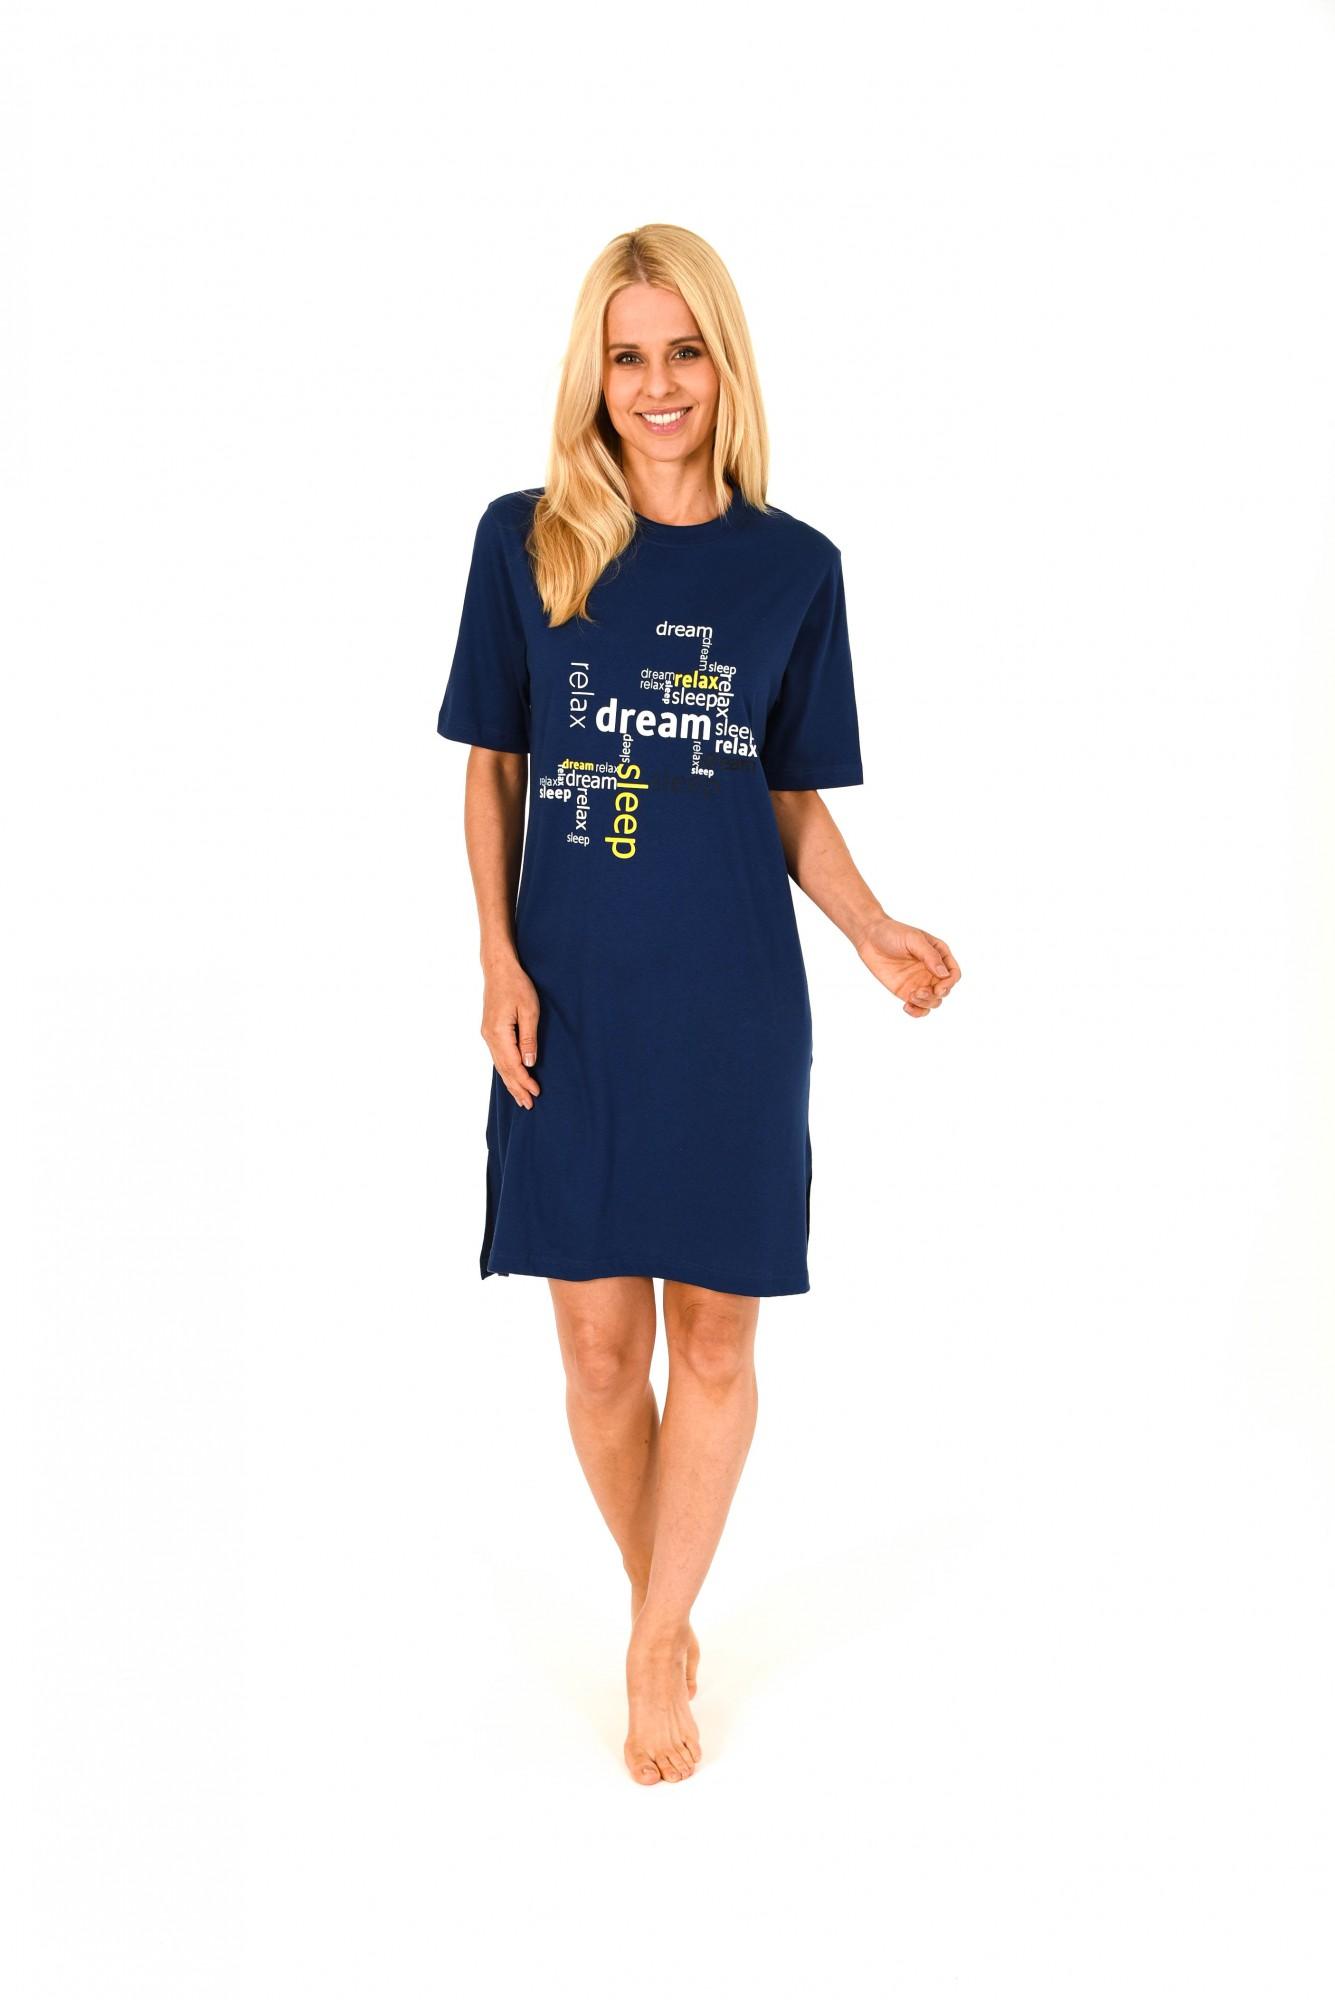 Damen Bigshirt kurzarm Nachthemd mit Frontprint – 171 213 90 828